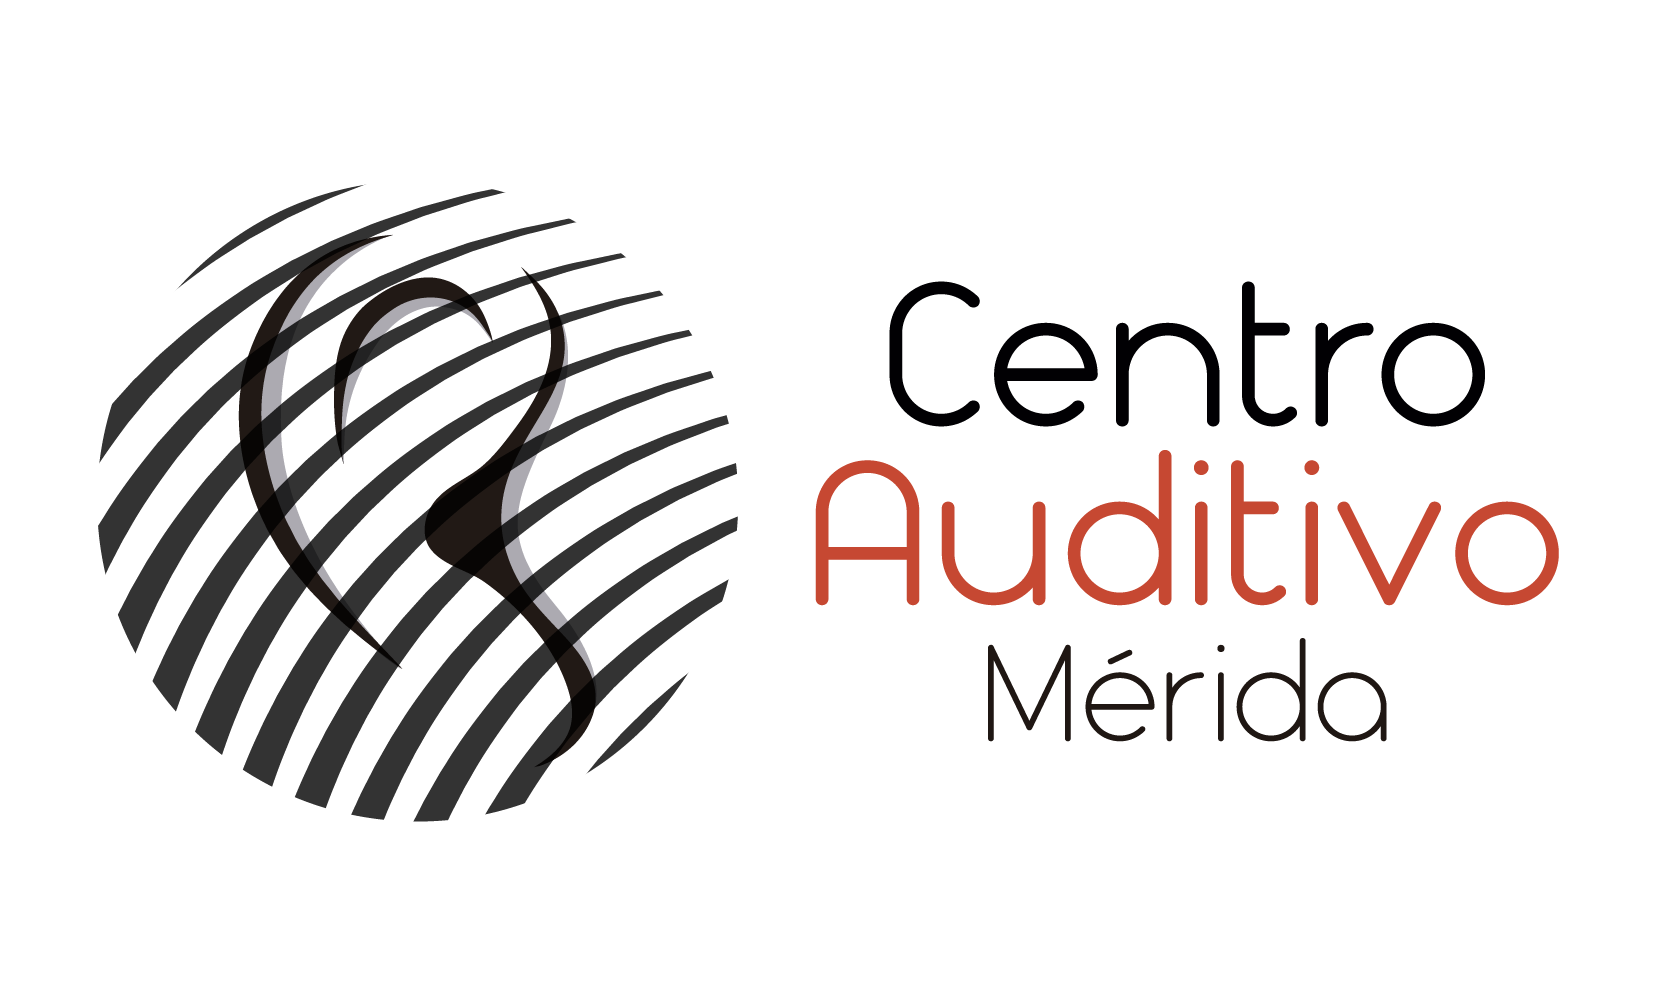 Centro Auditivo Merida